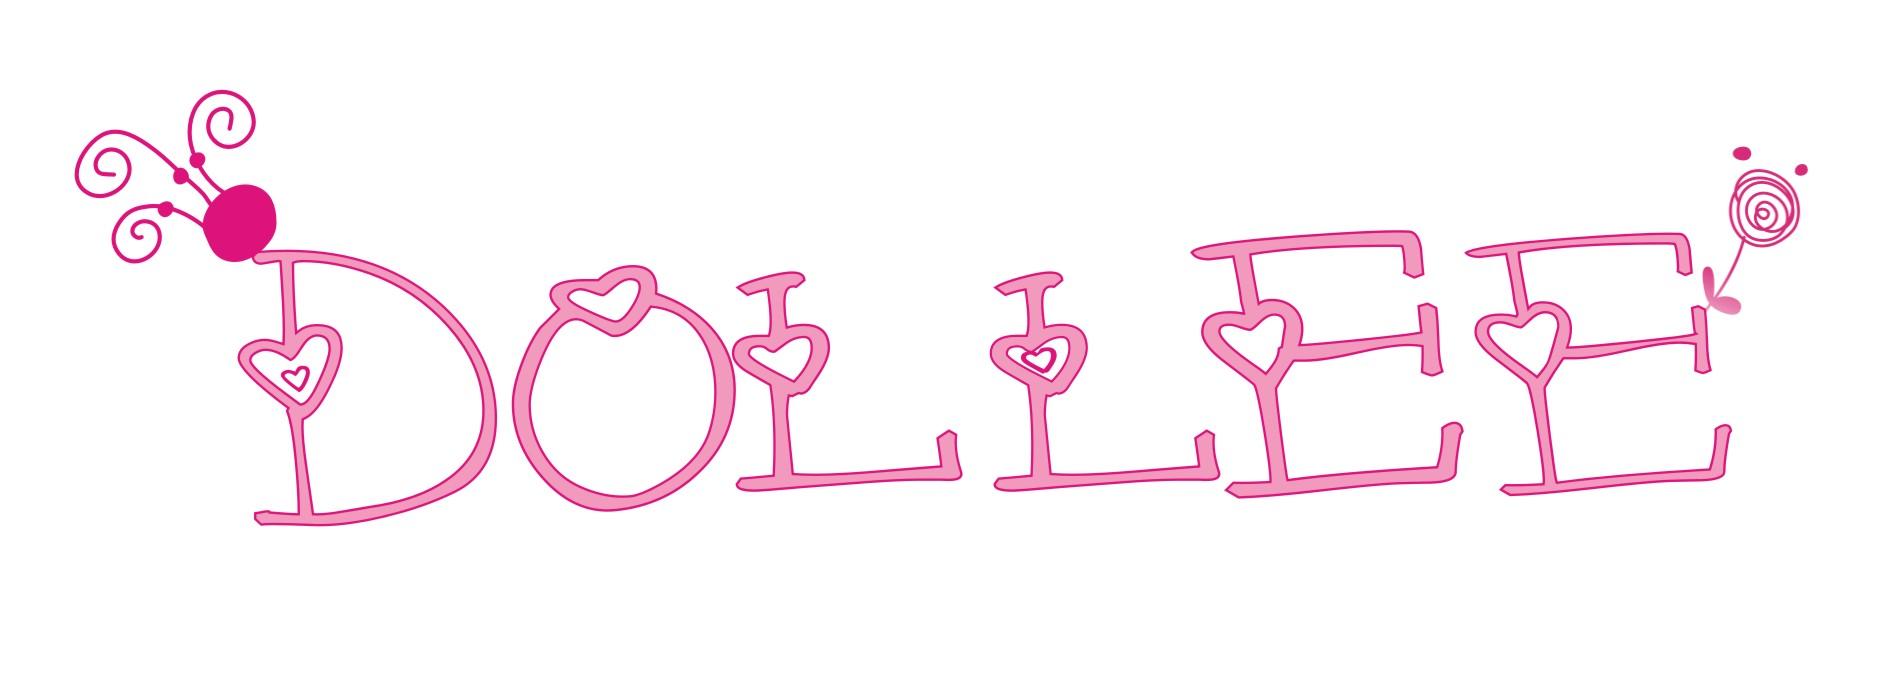 dollee logo设计,风格甜美系